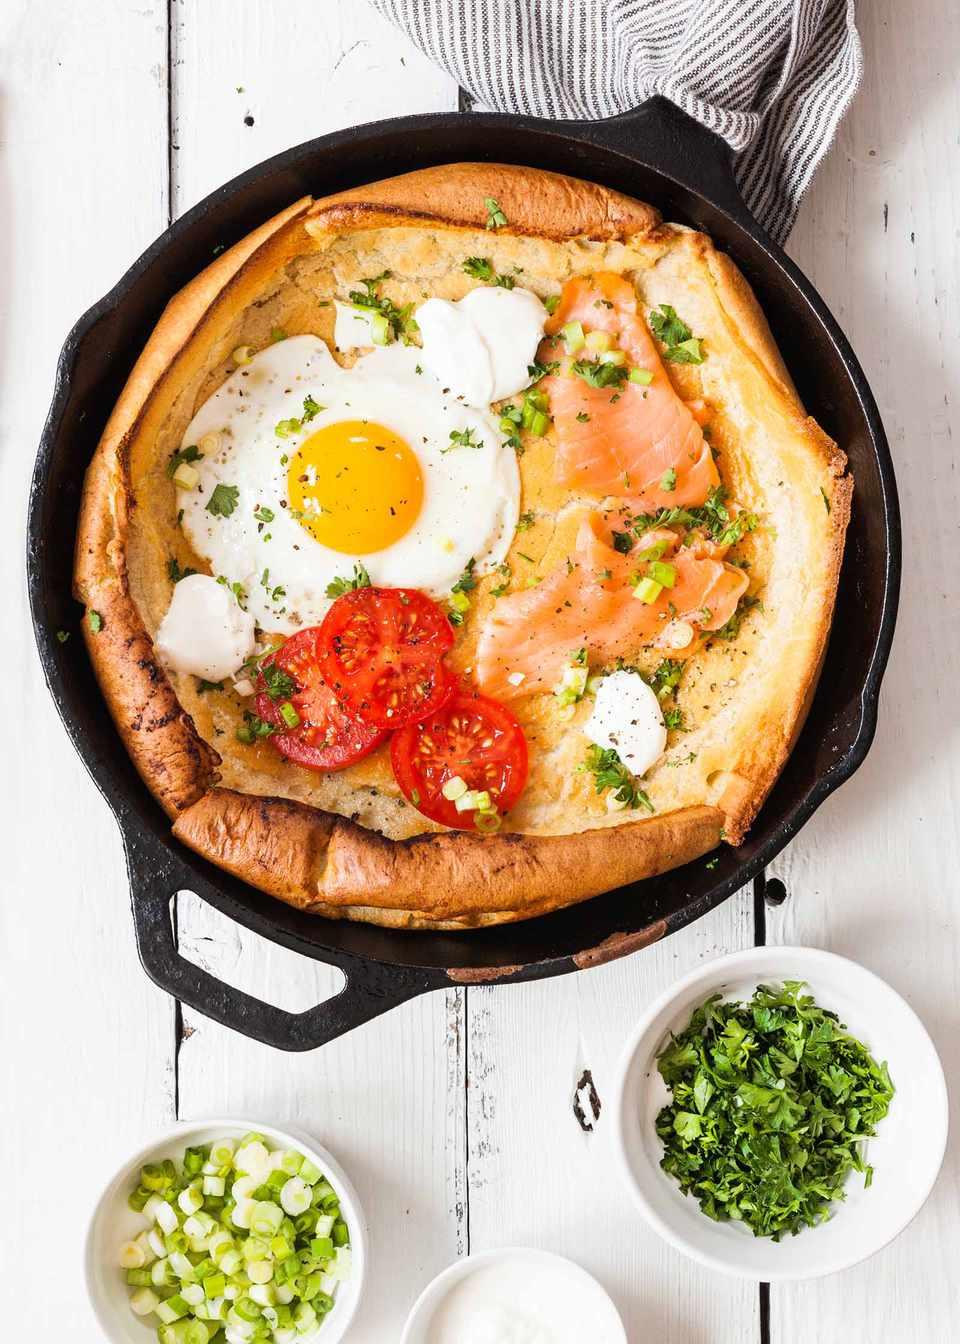 German Dutch Baby Pancake with Whole Wheat Flour